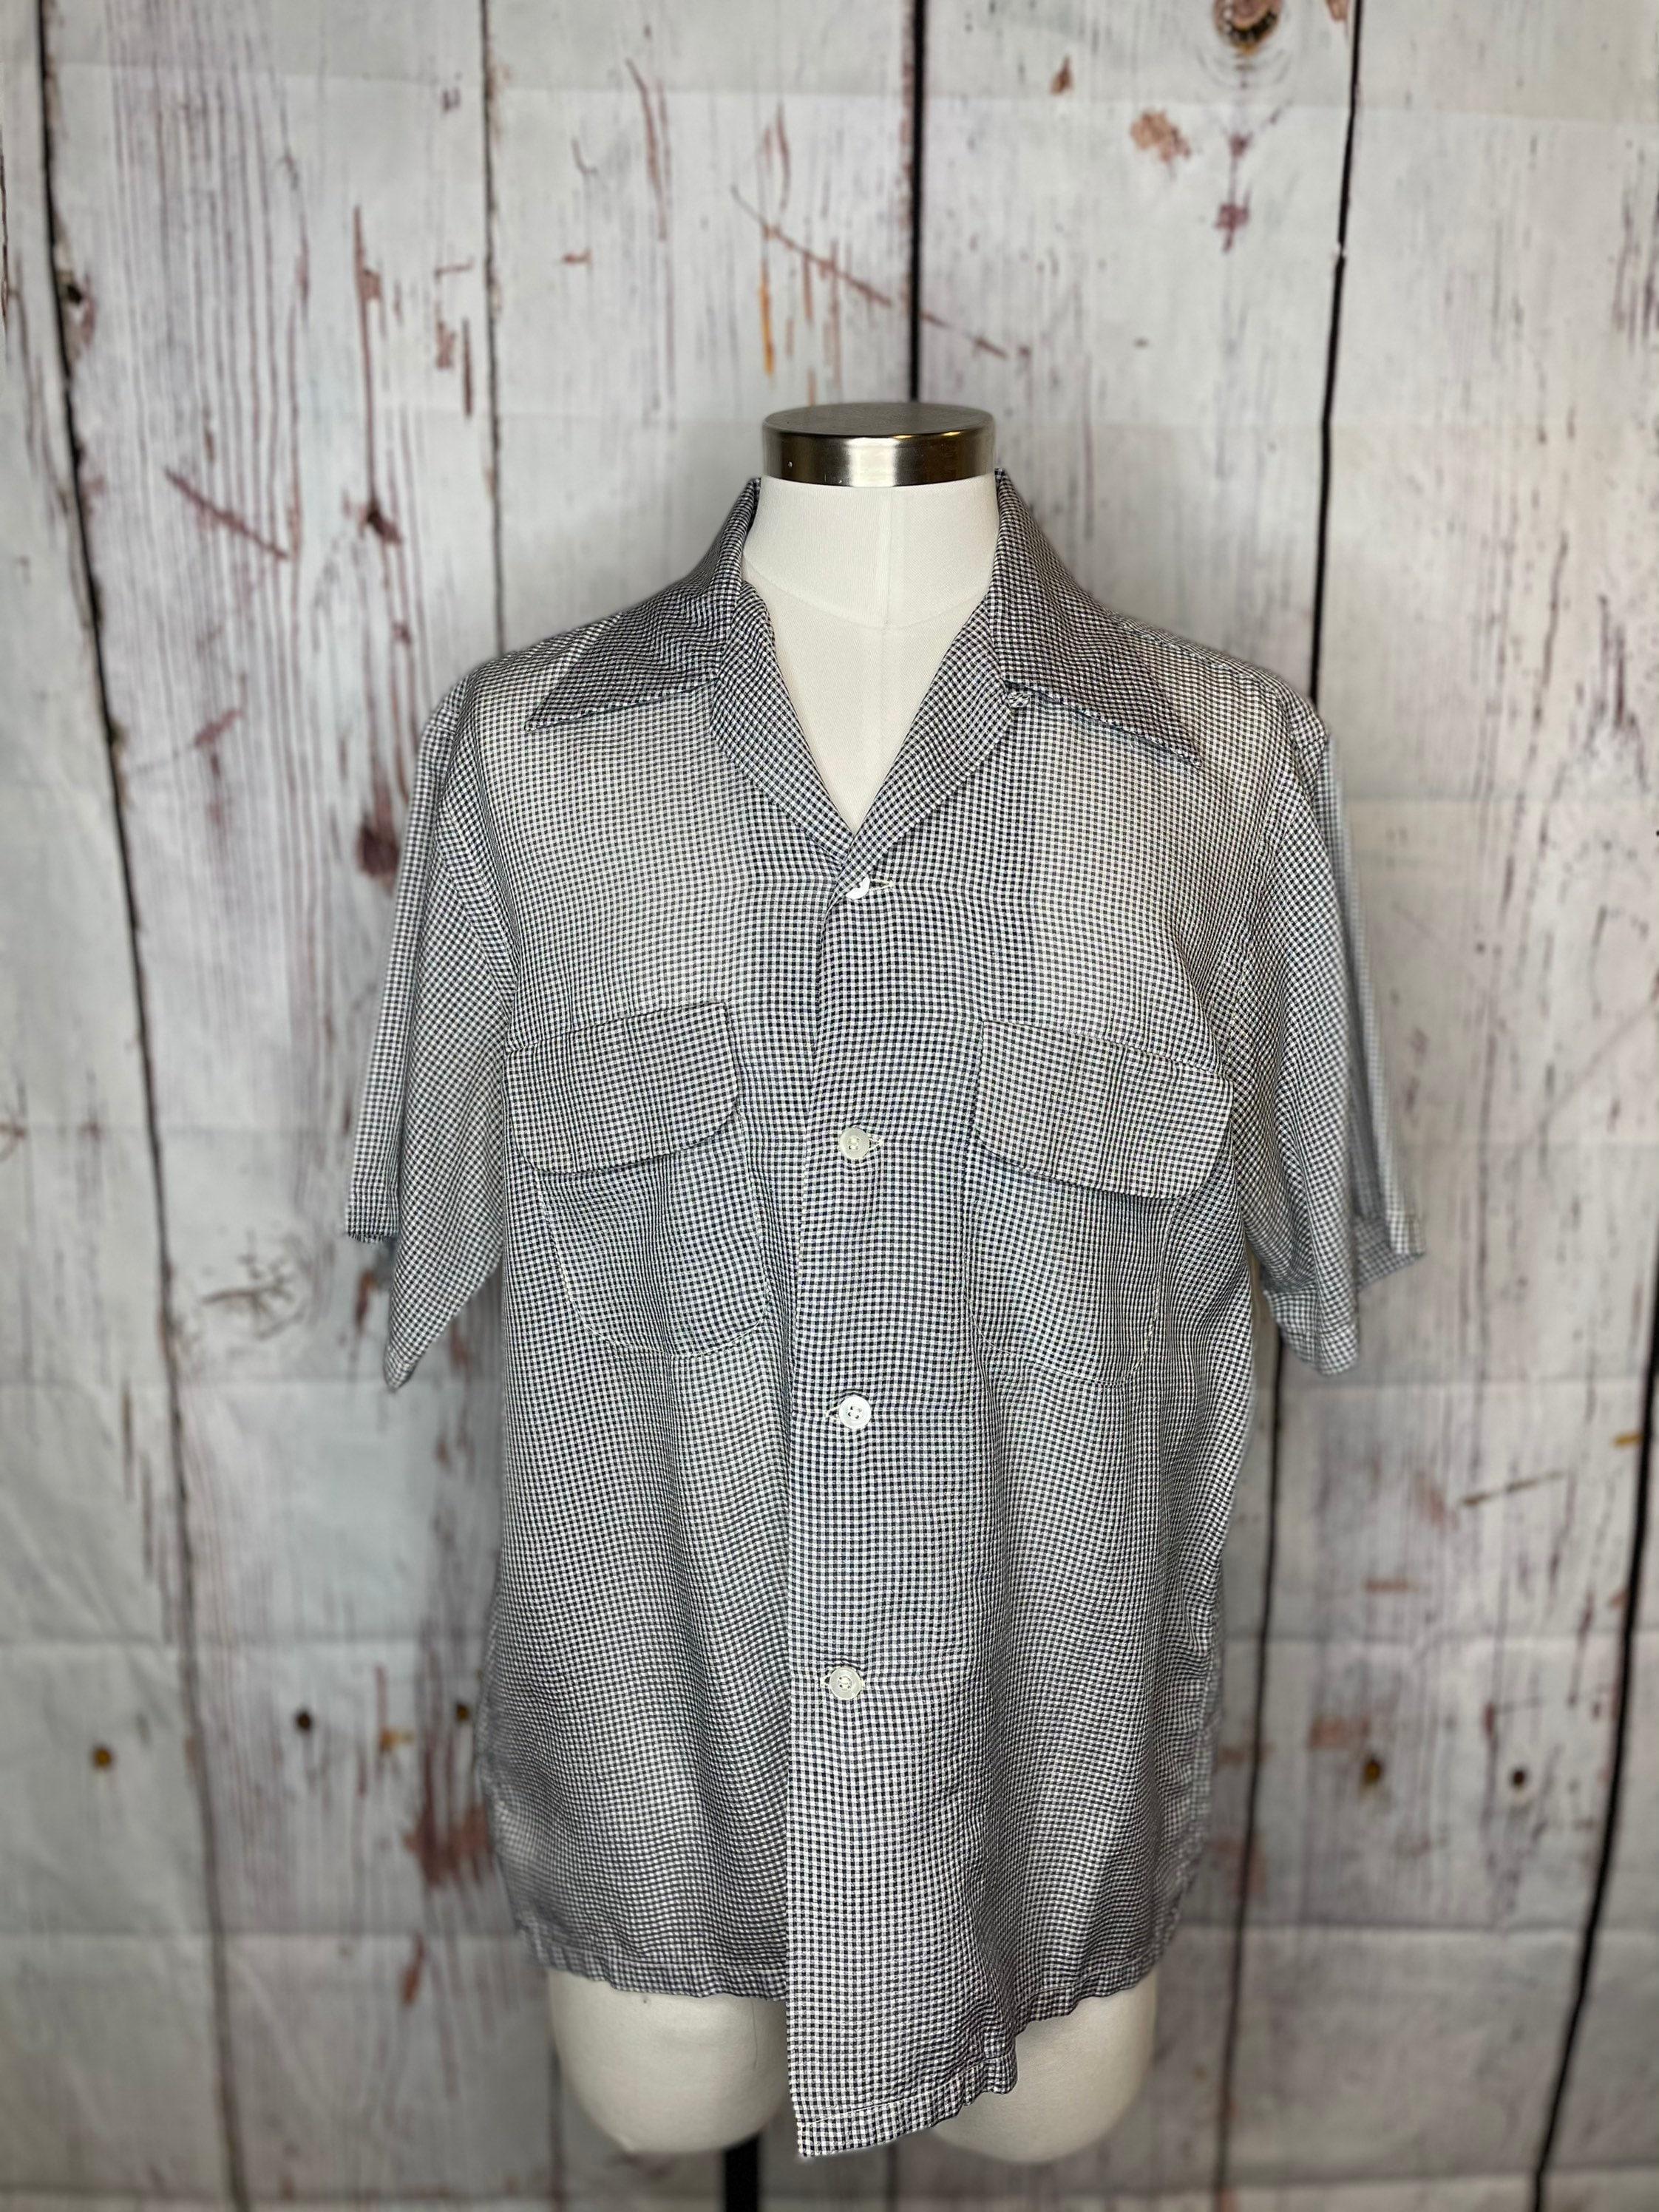 1950s Men's Ties, Bow Ties – Vintage, Skinny, Knit 1950S Mens Gingham Shirt $45.00 AT vintagedancer.com